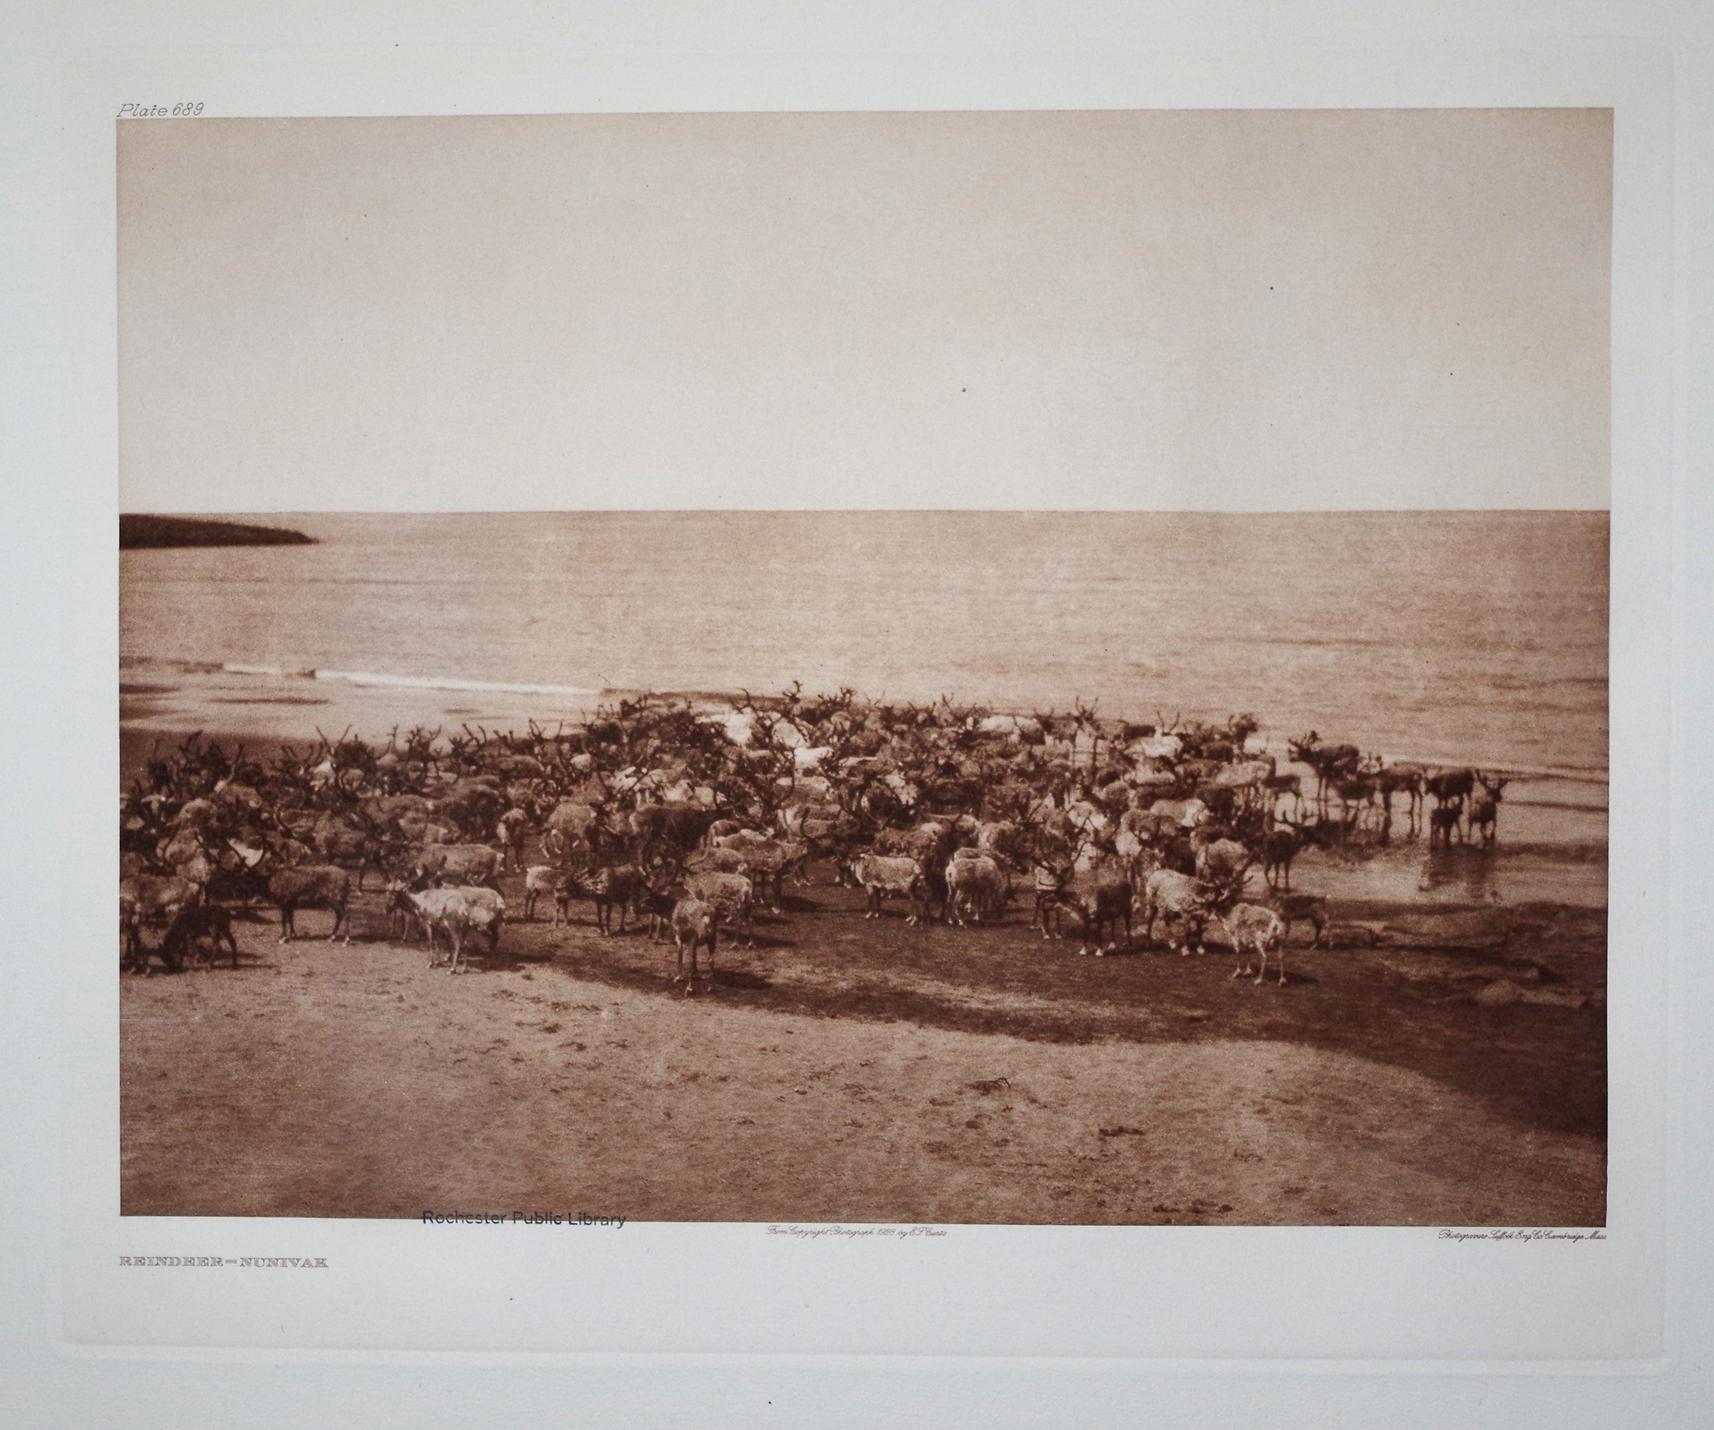 Reindeer - Nunivak, Plate 689 from The North American Indian. Portfolio XX: Edward S. Curtis (1868-...